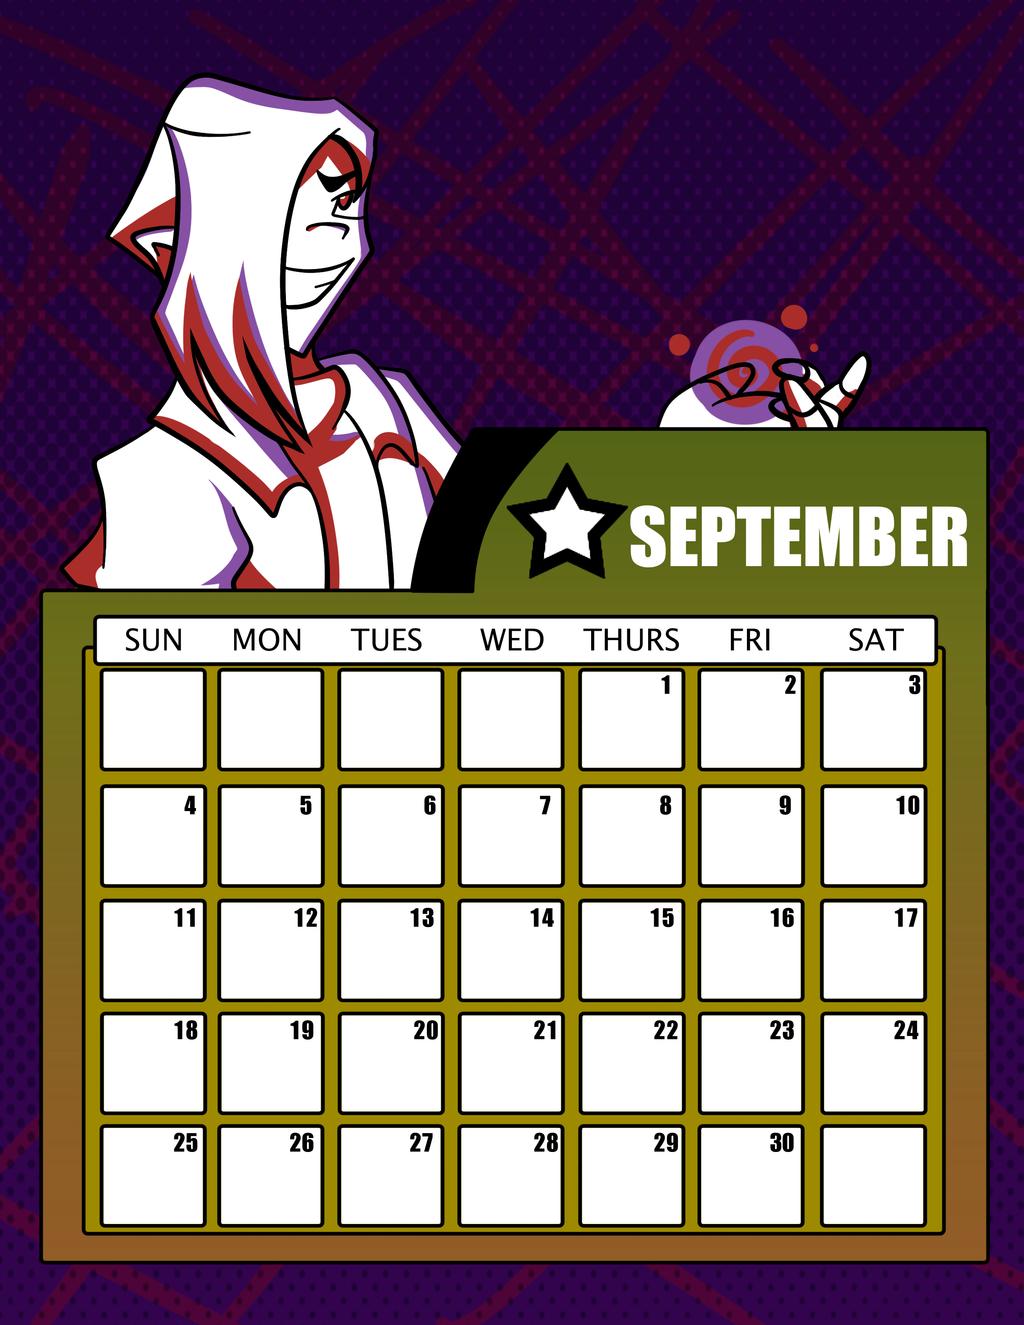 Deviantart Calendar : Dtgr calendar september by eleanorose on deviantart